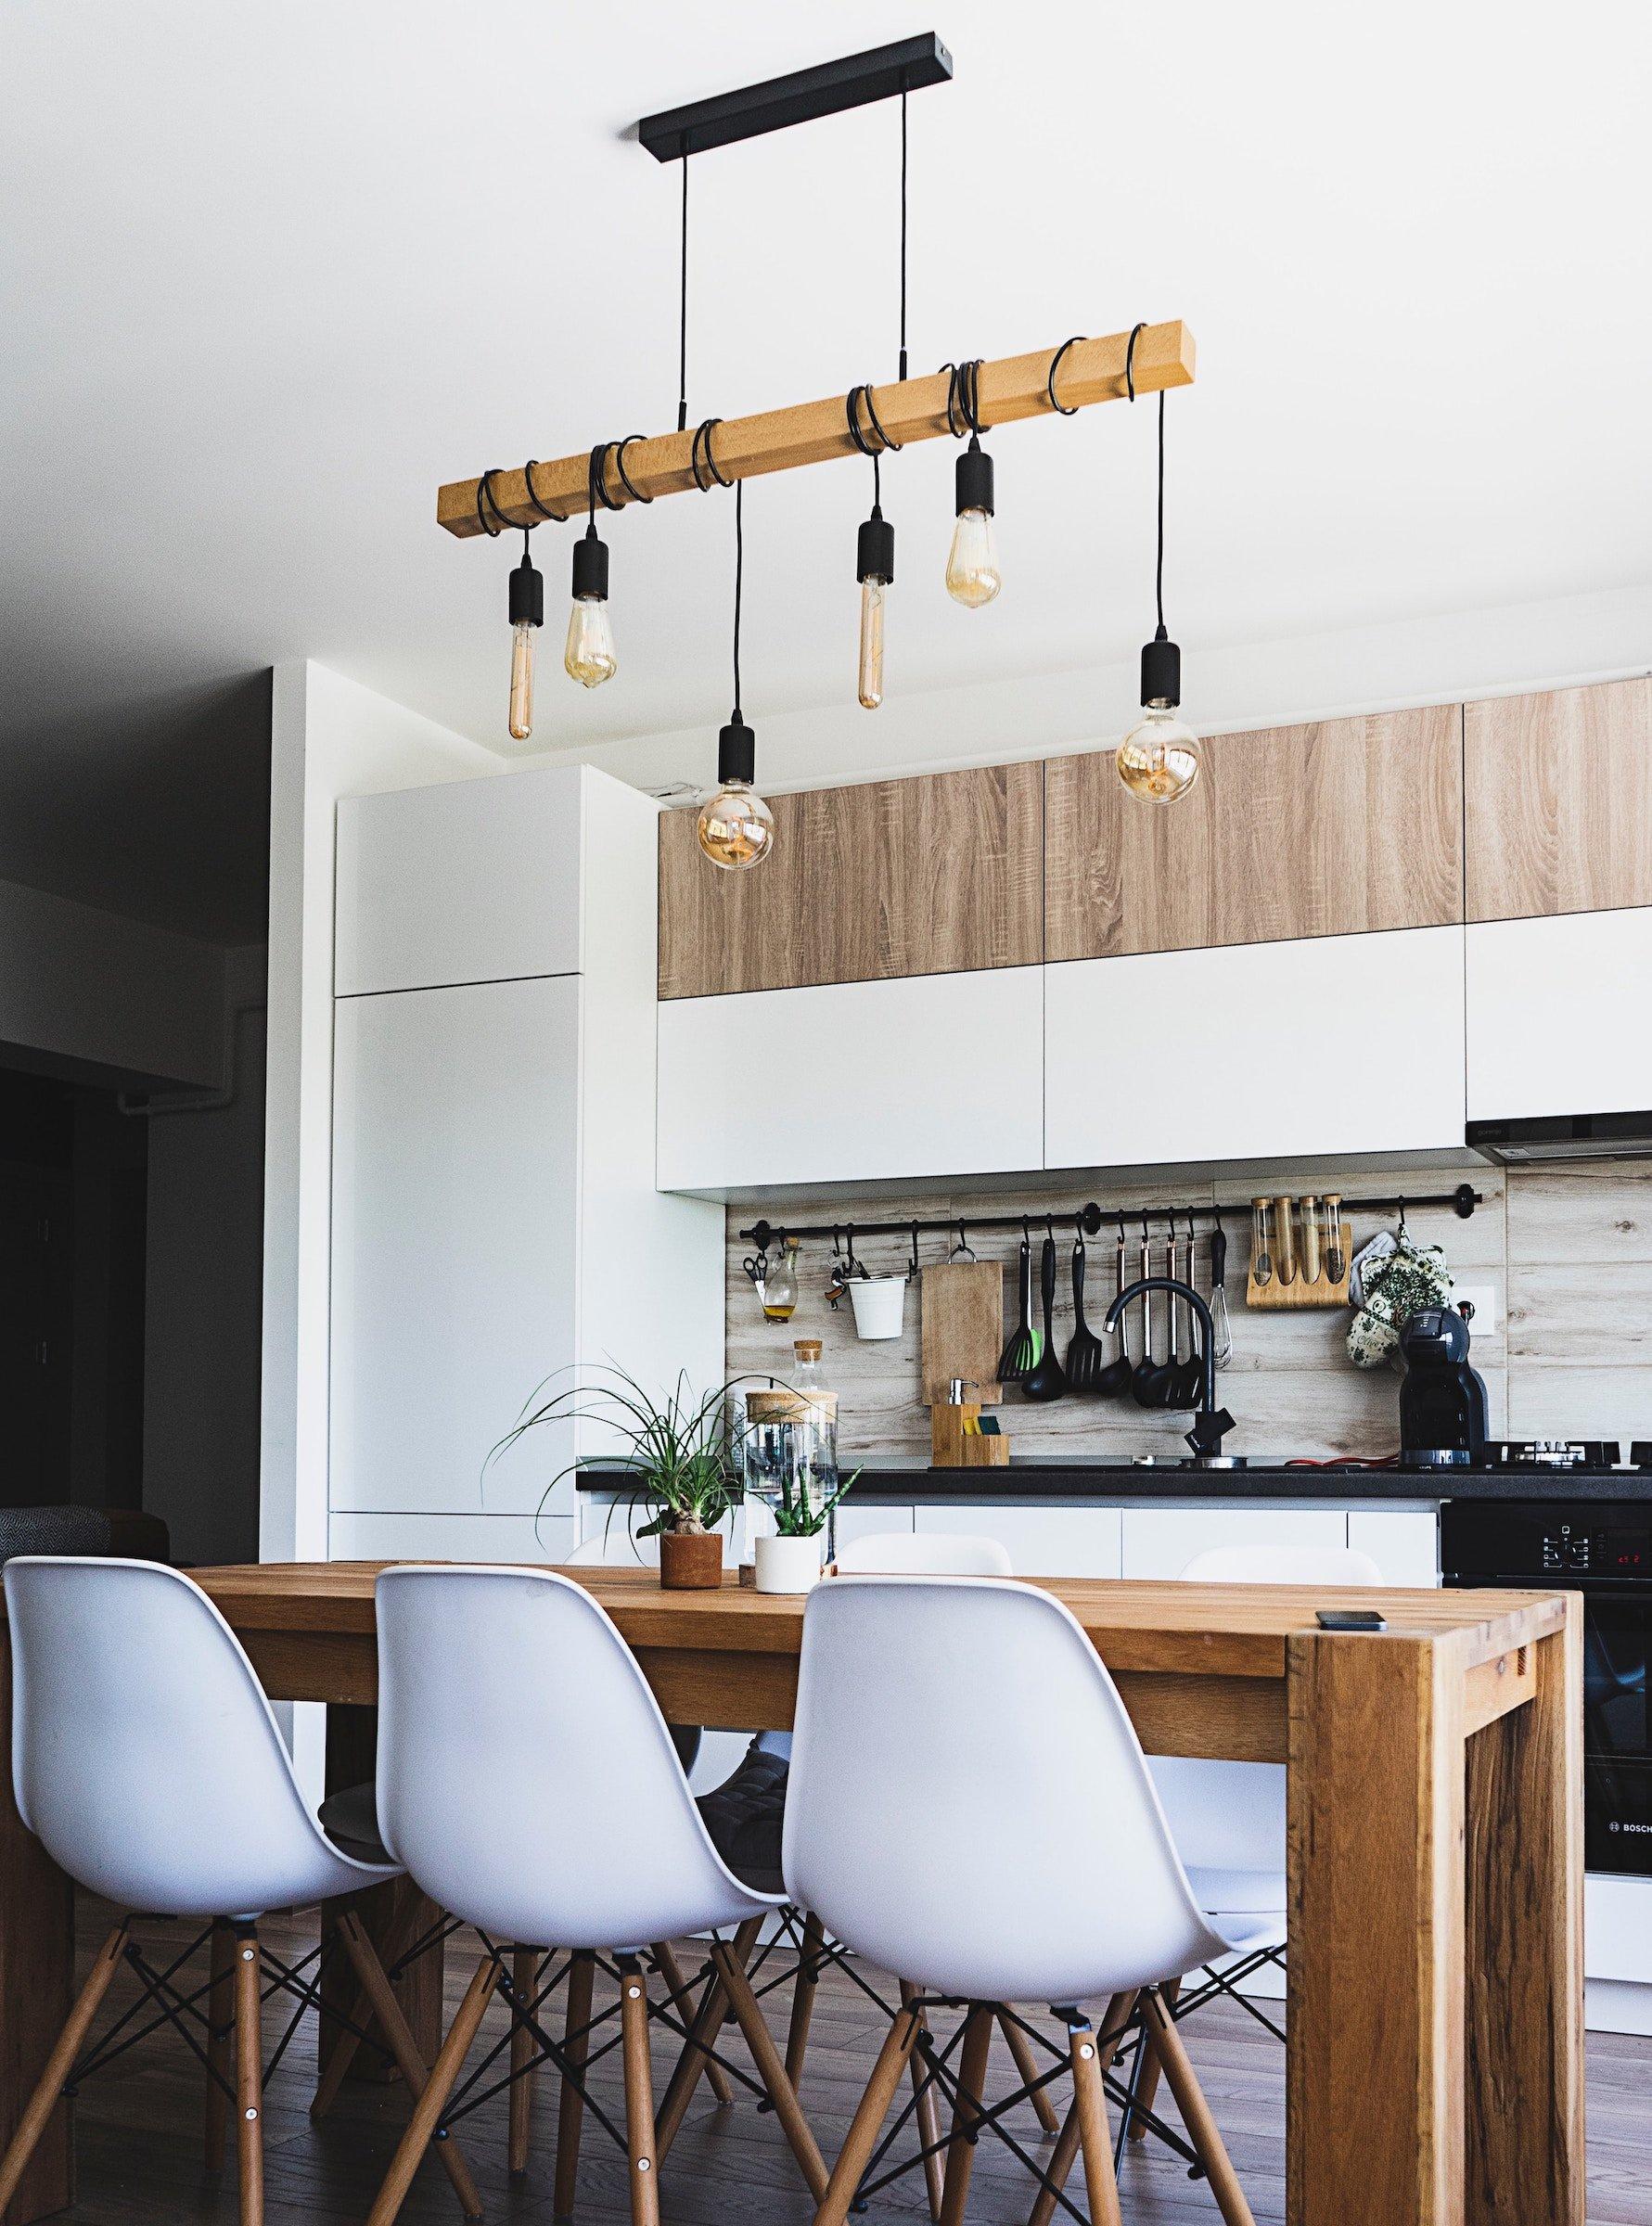 Another favorite kitchen design trend of 2019: pendant lighting